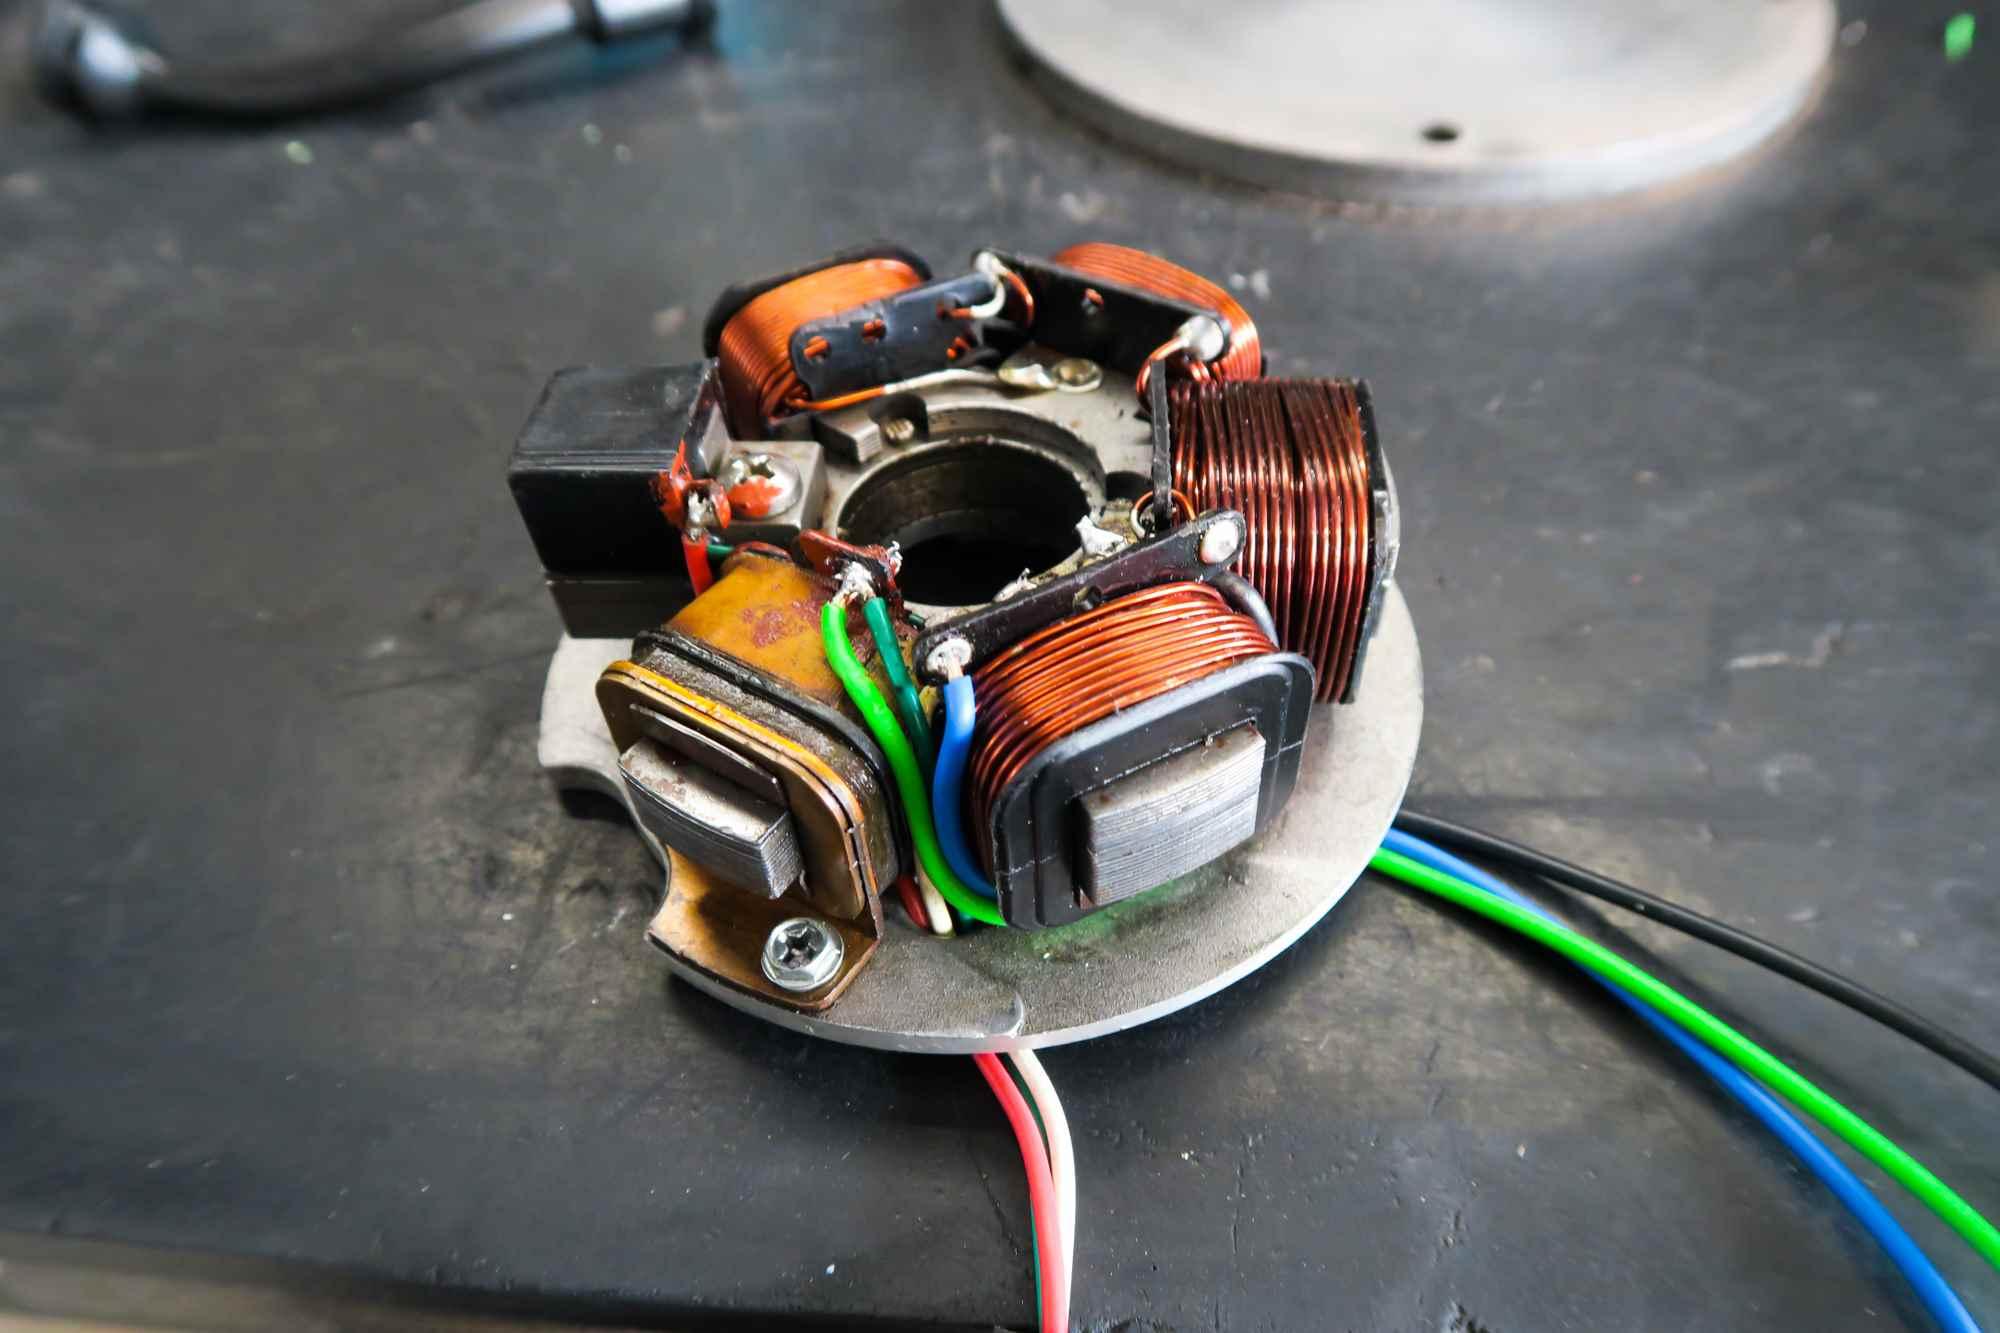 Neue Kabel an Ducati Elektronikzündung für Vespa PK50